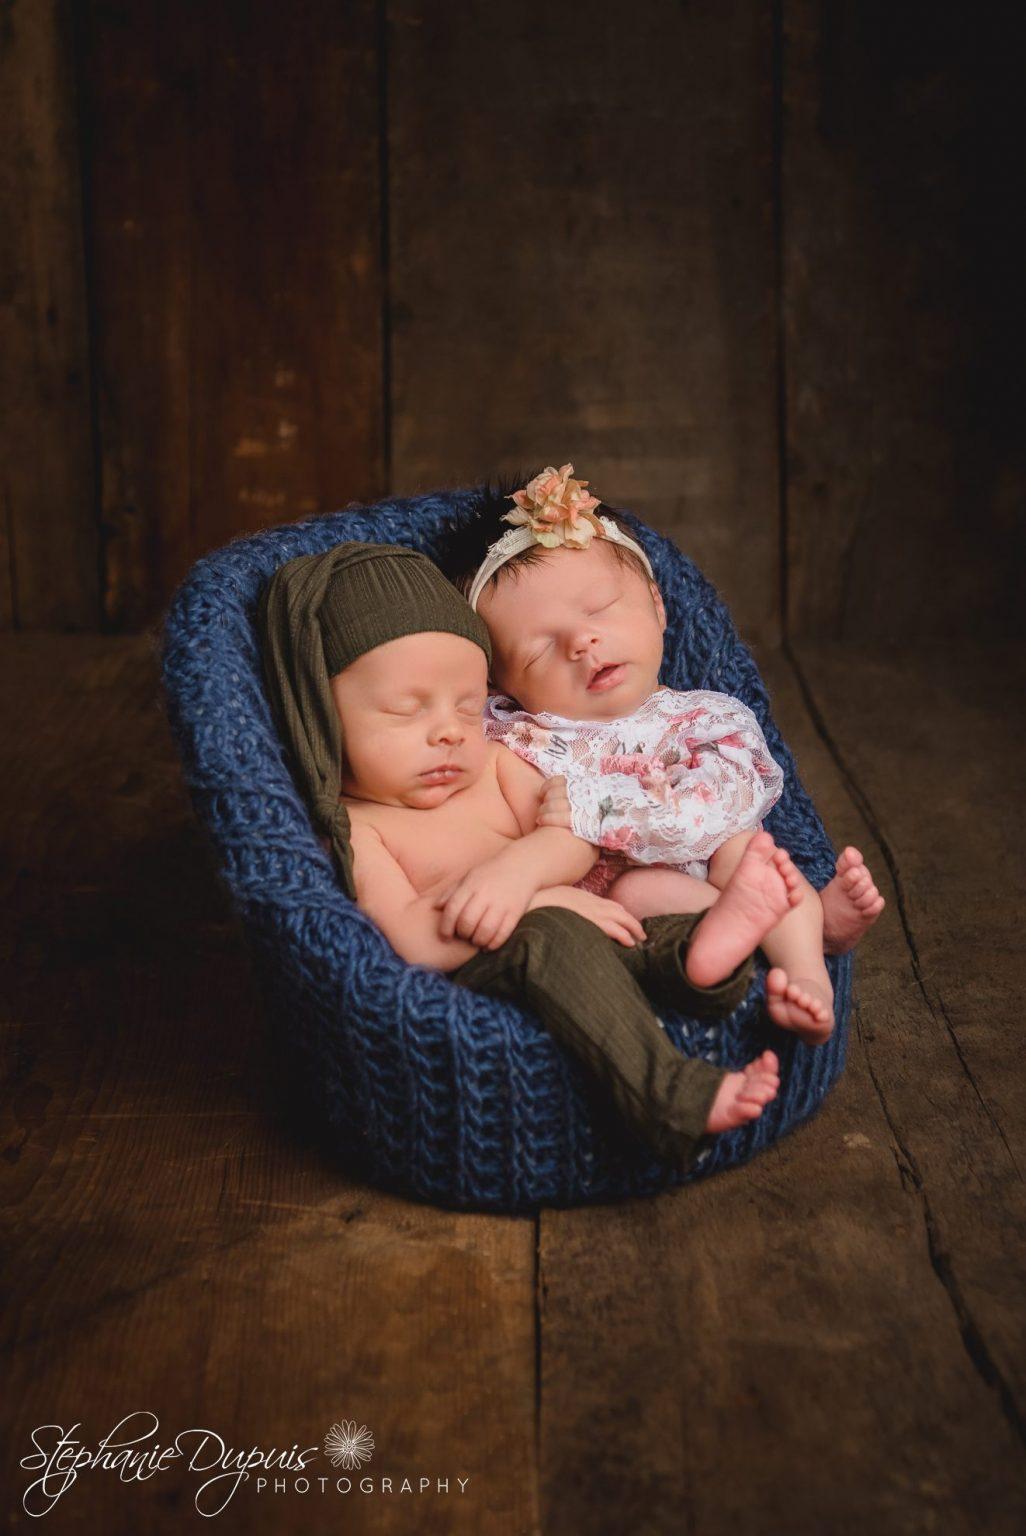 Lena and Asa 7 1026x1536 - Portfolio: Lena & Asa Newborn Session